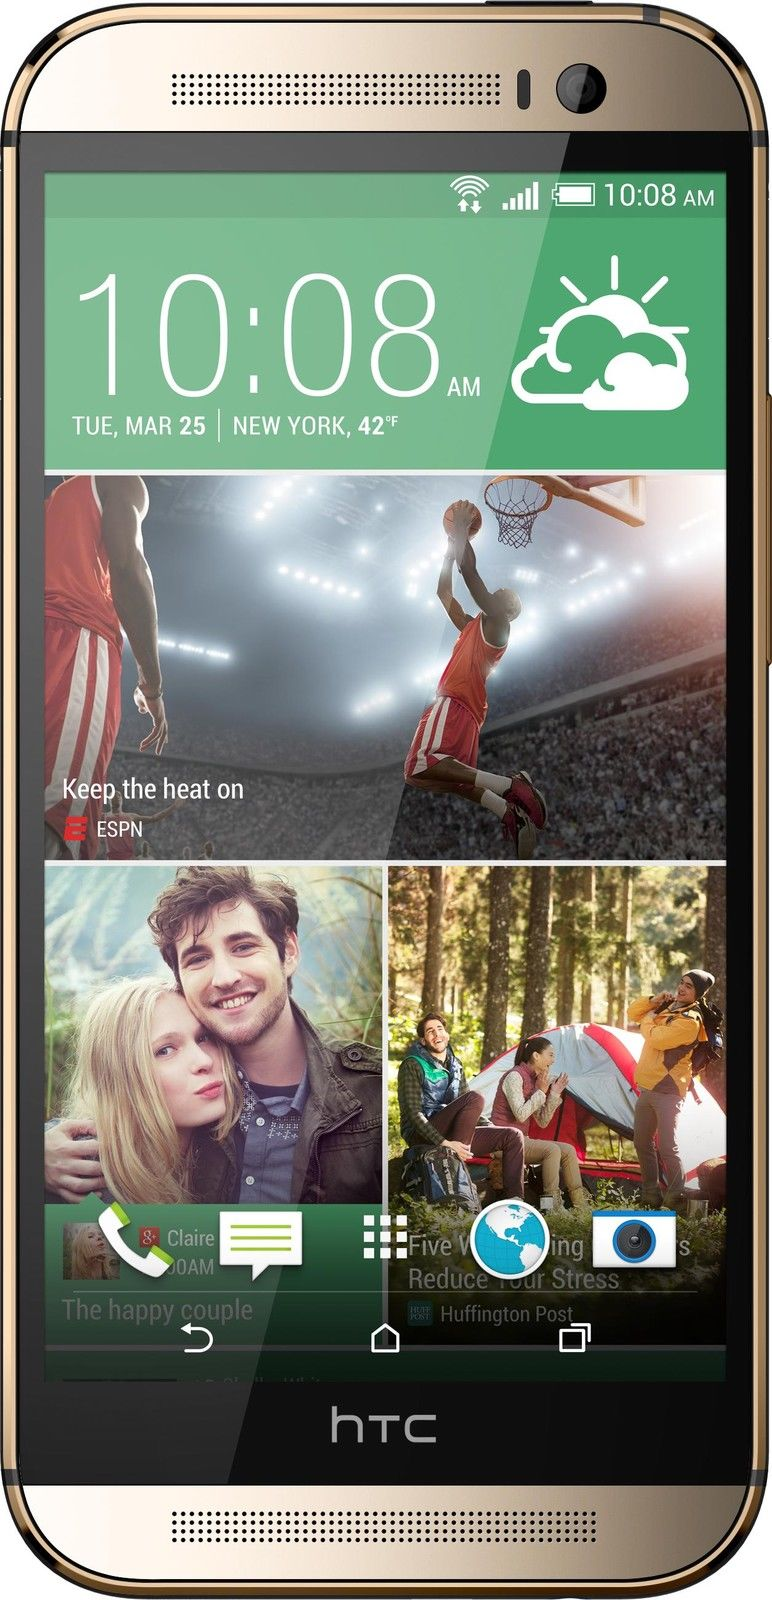 HTC One M8 - 32GB - Amber Gold (Sprint) Smartphone (Harman/Kardon Edition)